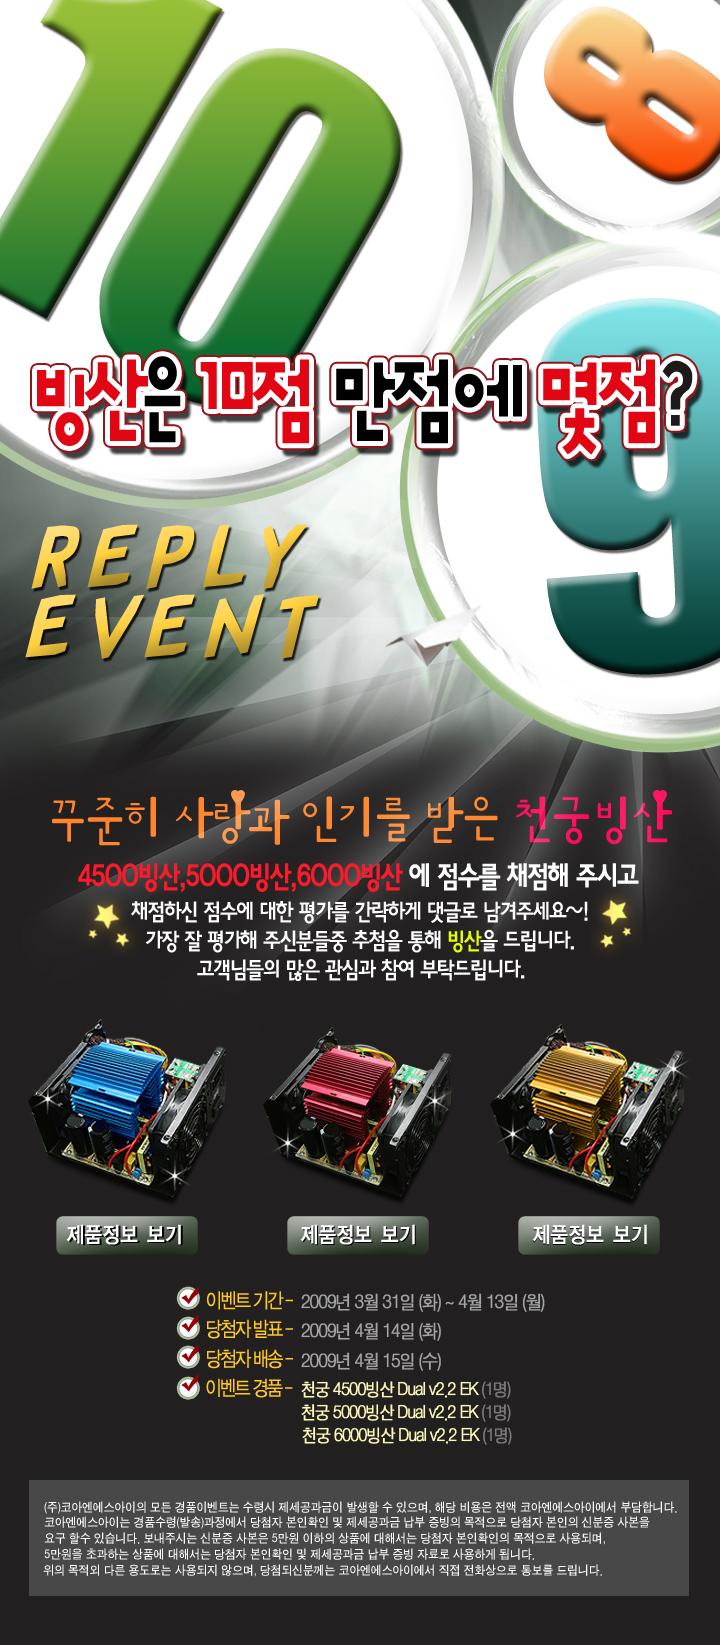 0331_event.jpg